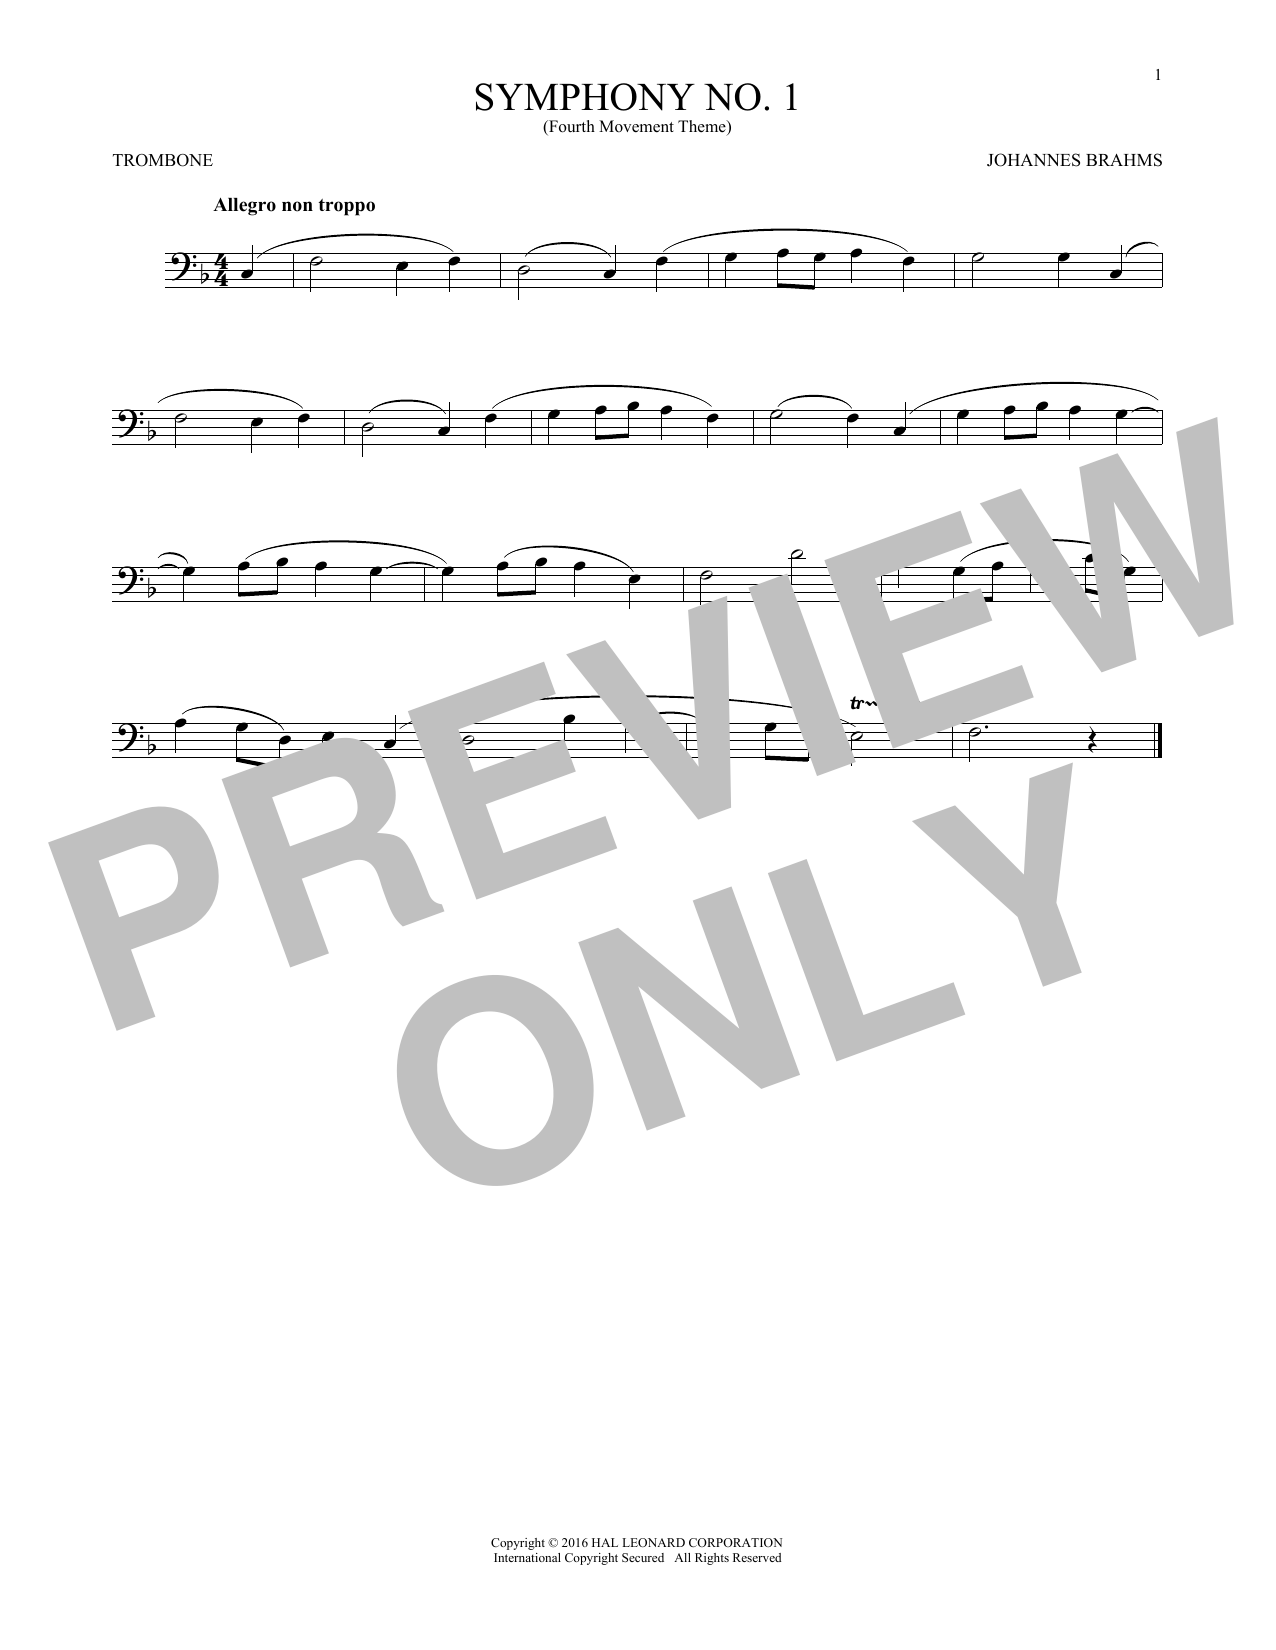 Symphony No. 1 In C Minor, Fourth Movement Excerpt (Trombone Solo)